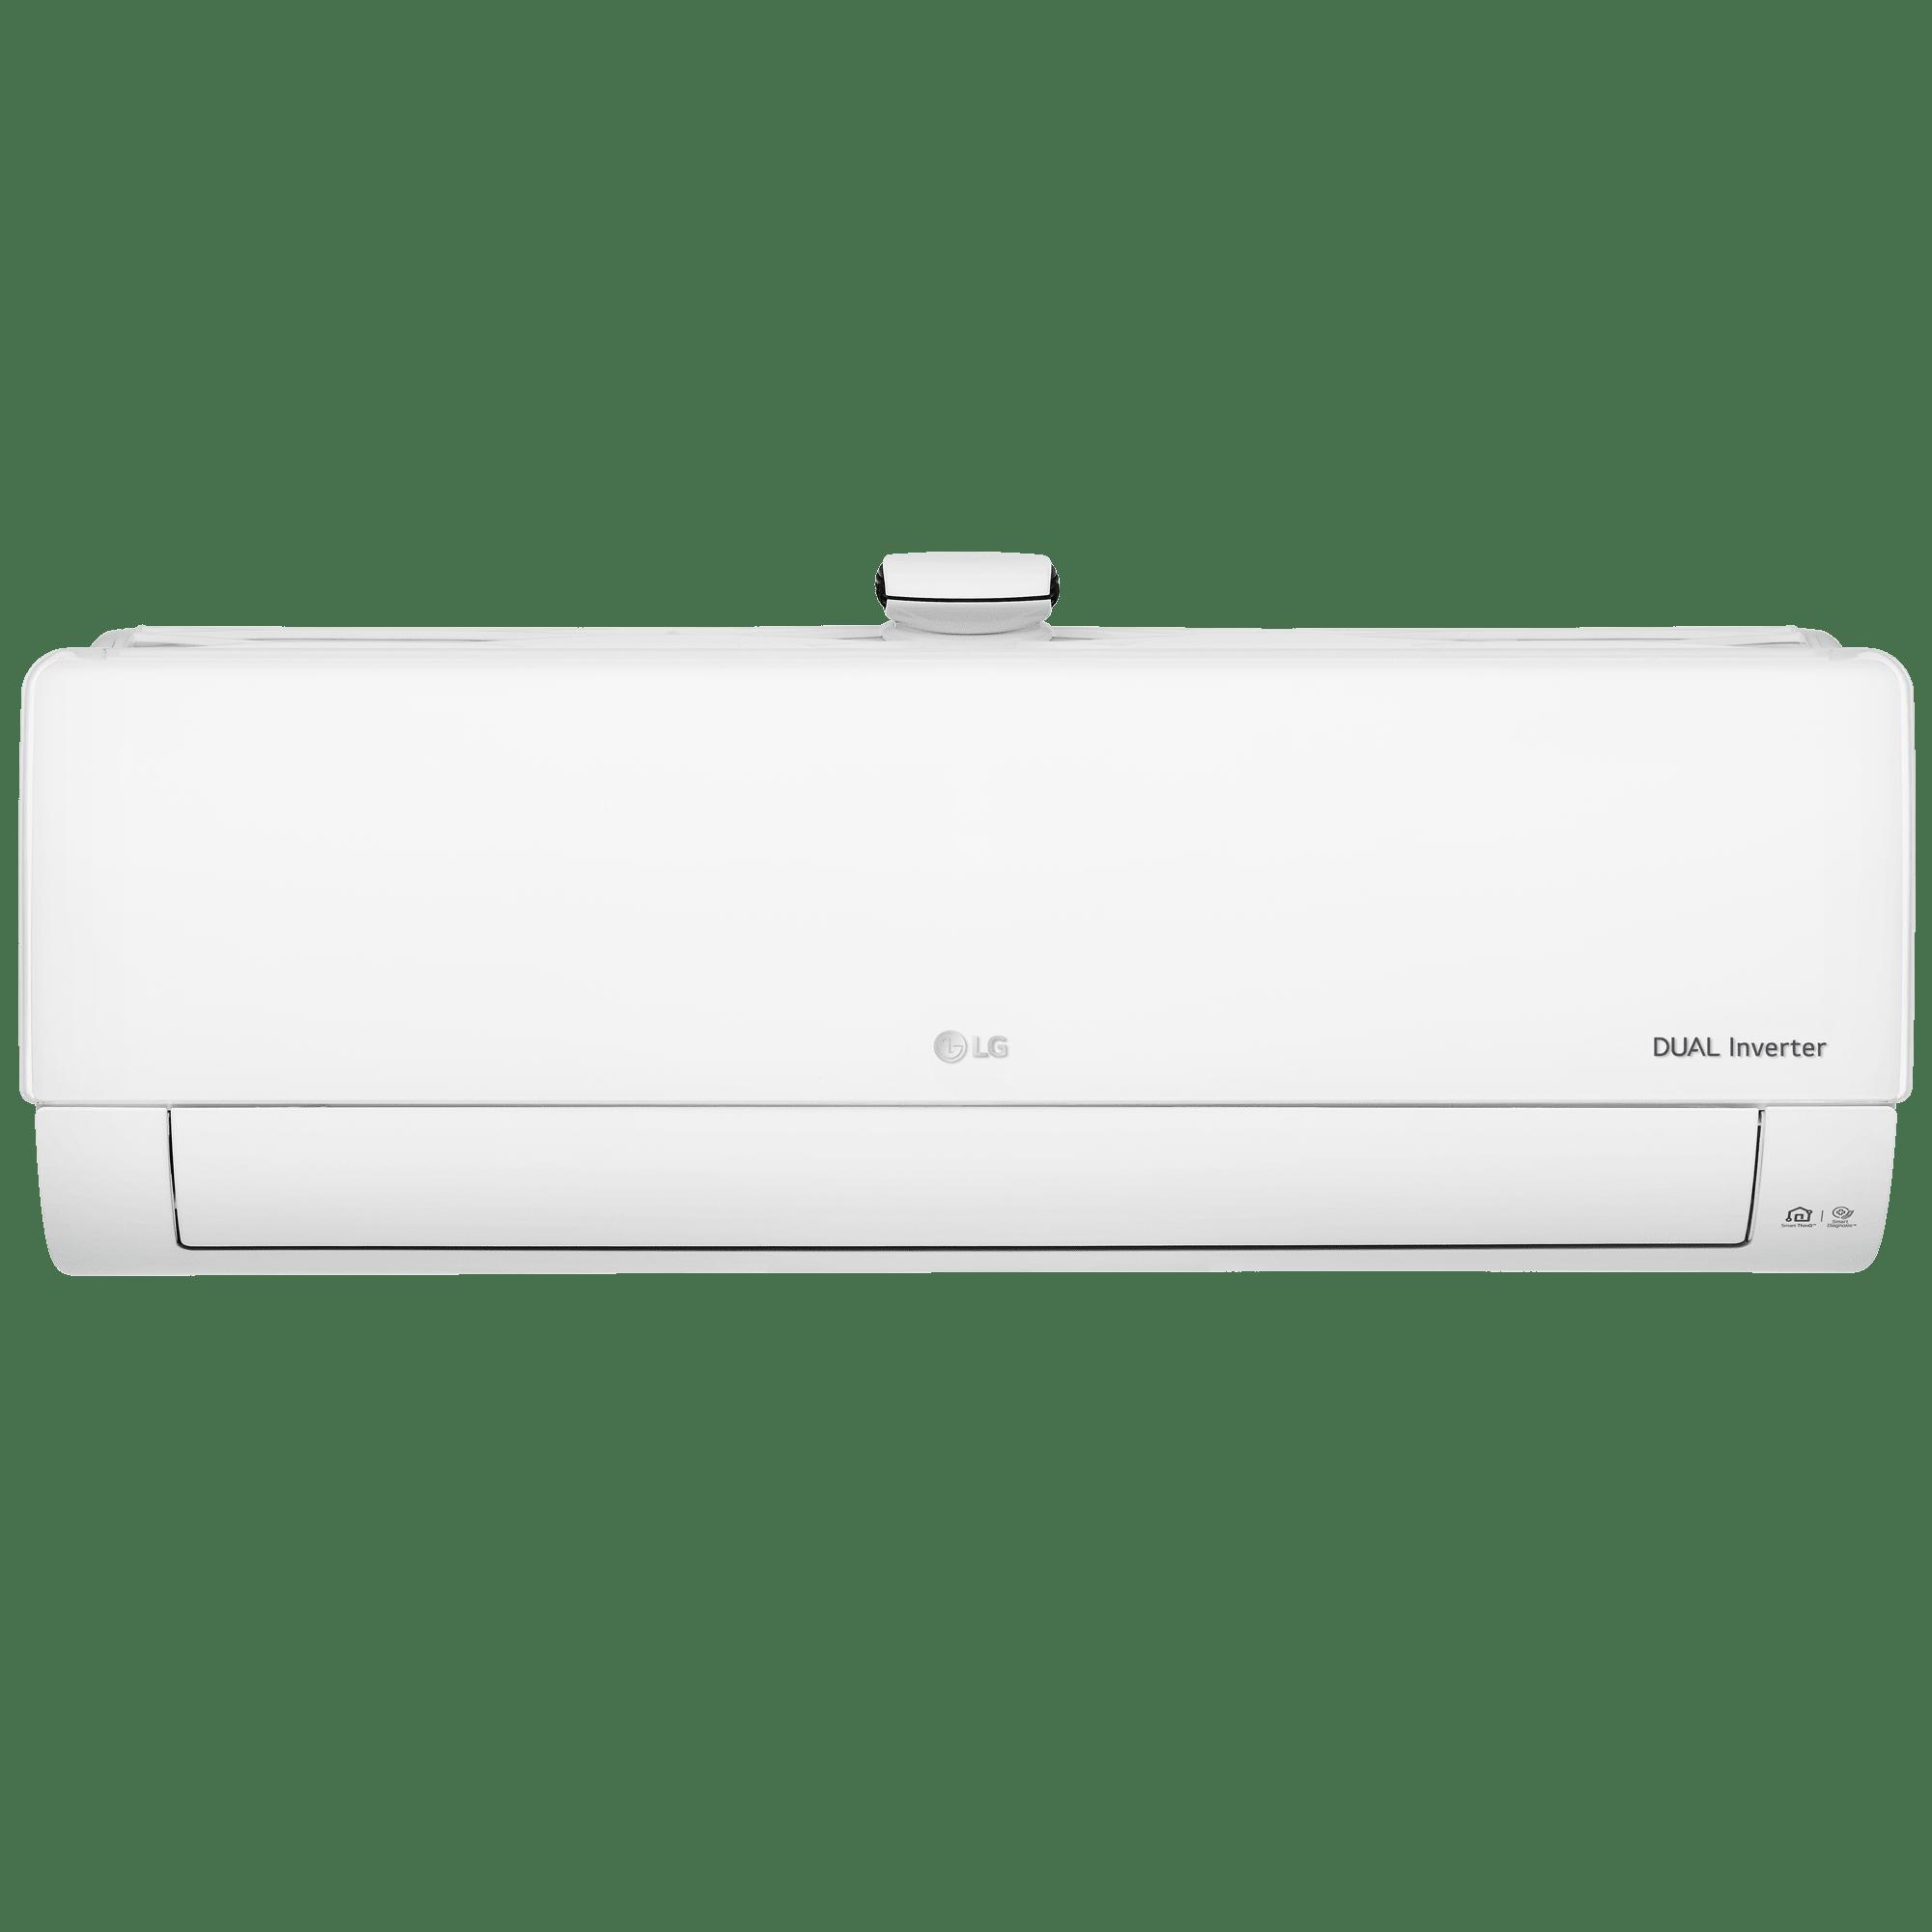 LG 1.5 Ton 5 Star Inverter Split AC (Air Purification Function, Wi-Fi, Copper Condenser, MS-Q18APZE, White)